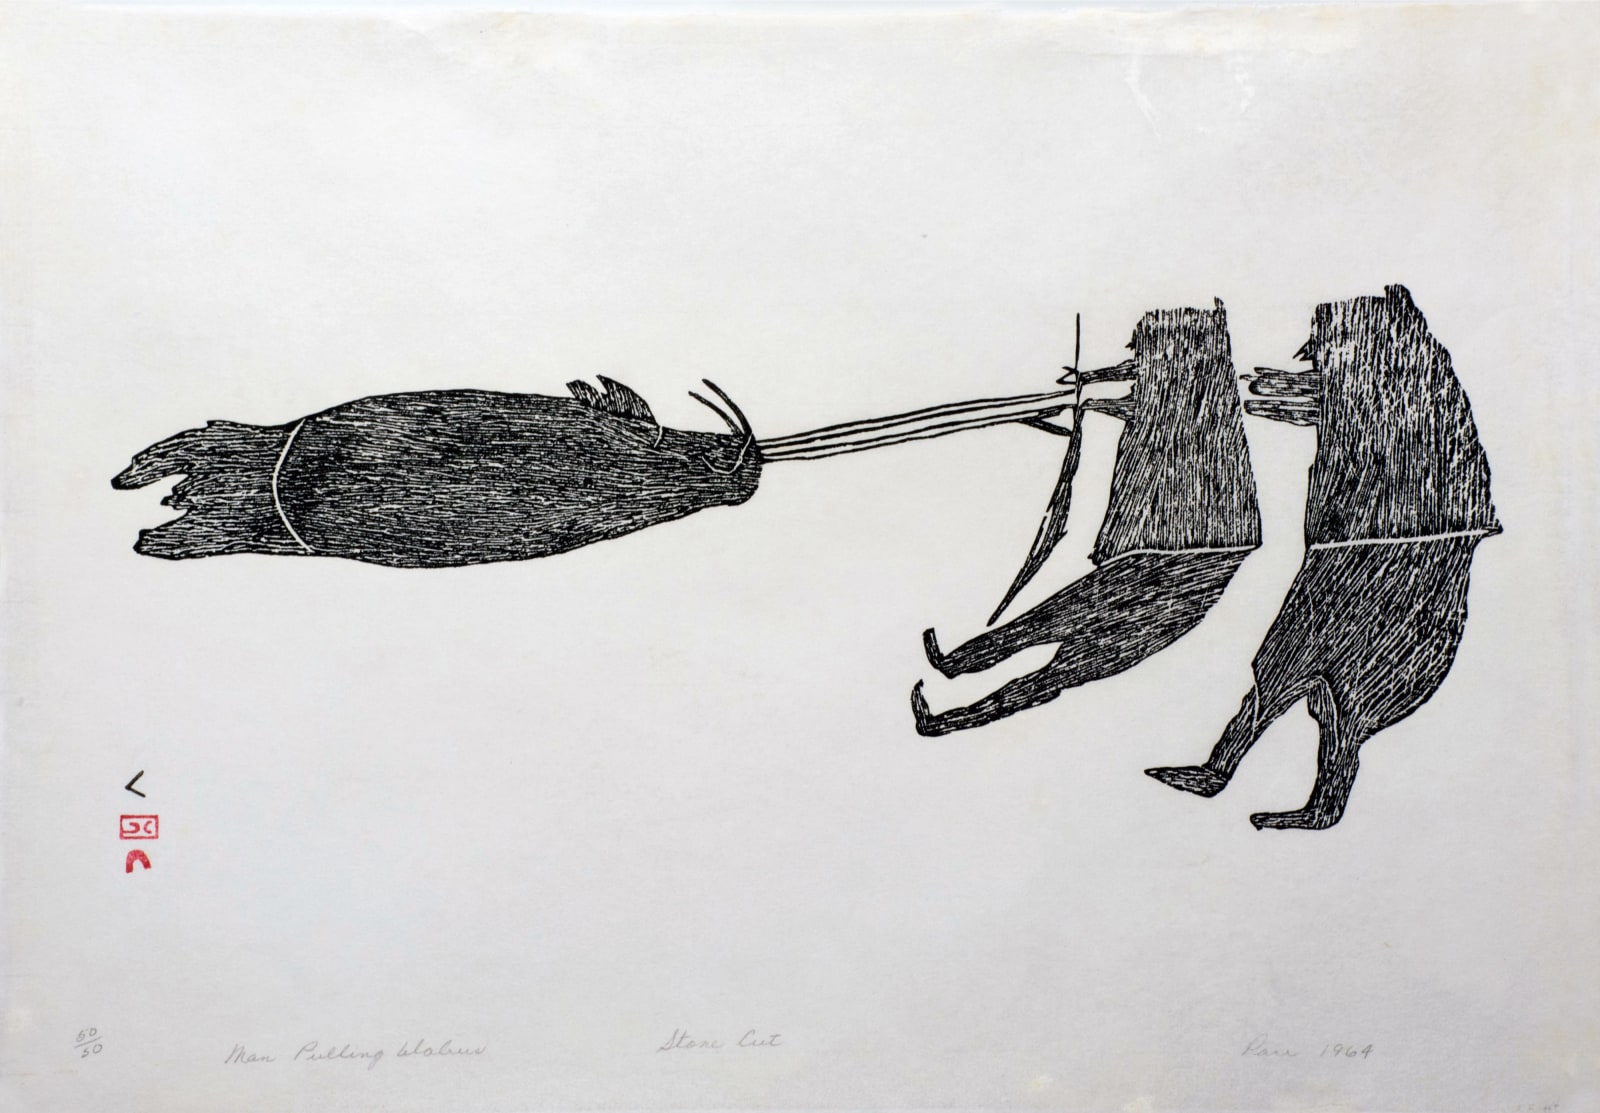 PARR (1893-1969) KINNGAIT (CAPE DORSET) Men Pulling a Walrus / Man Pulling a Walrus, 1964 (1964/5 #60) stonecut, 17.125 x 24.5 in (43.2 x 62.2 cm) $3,800